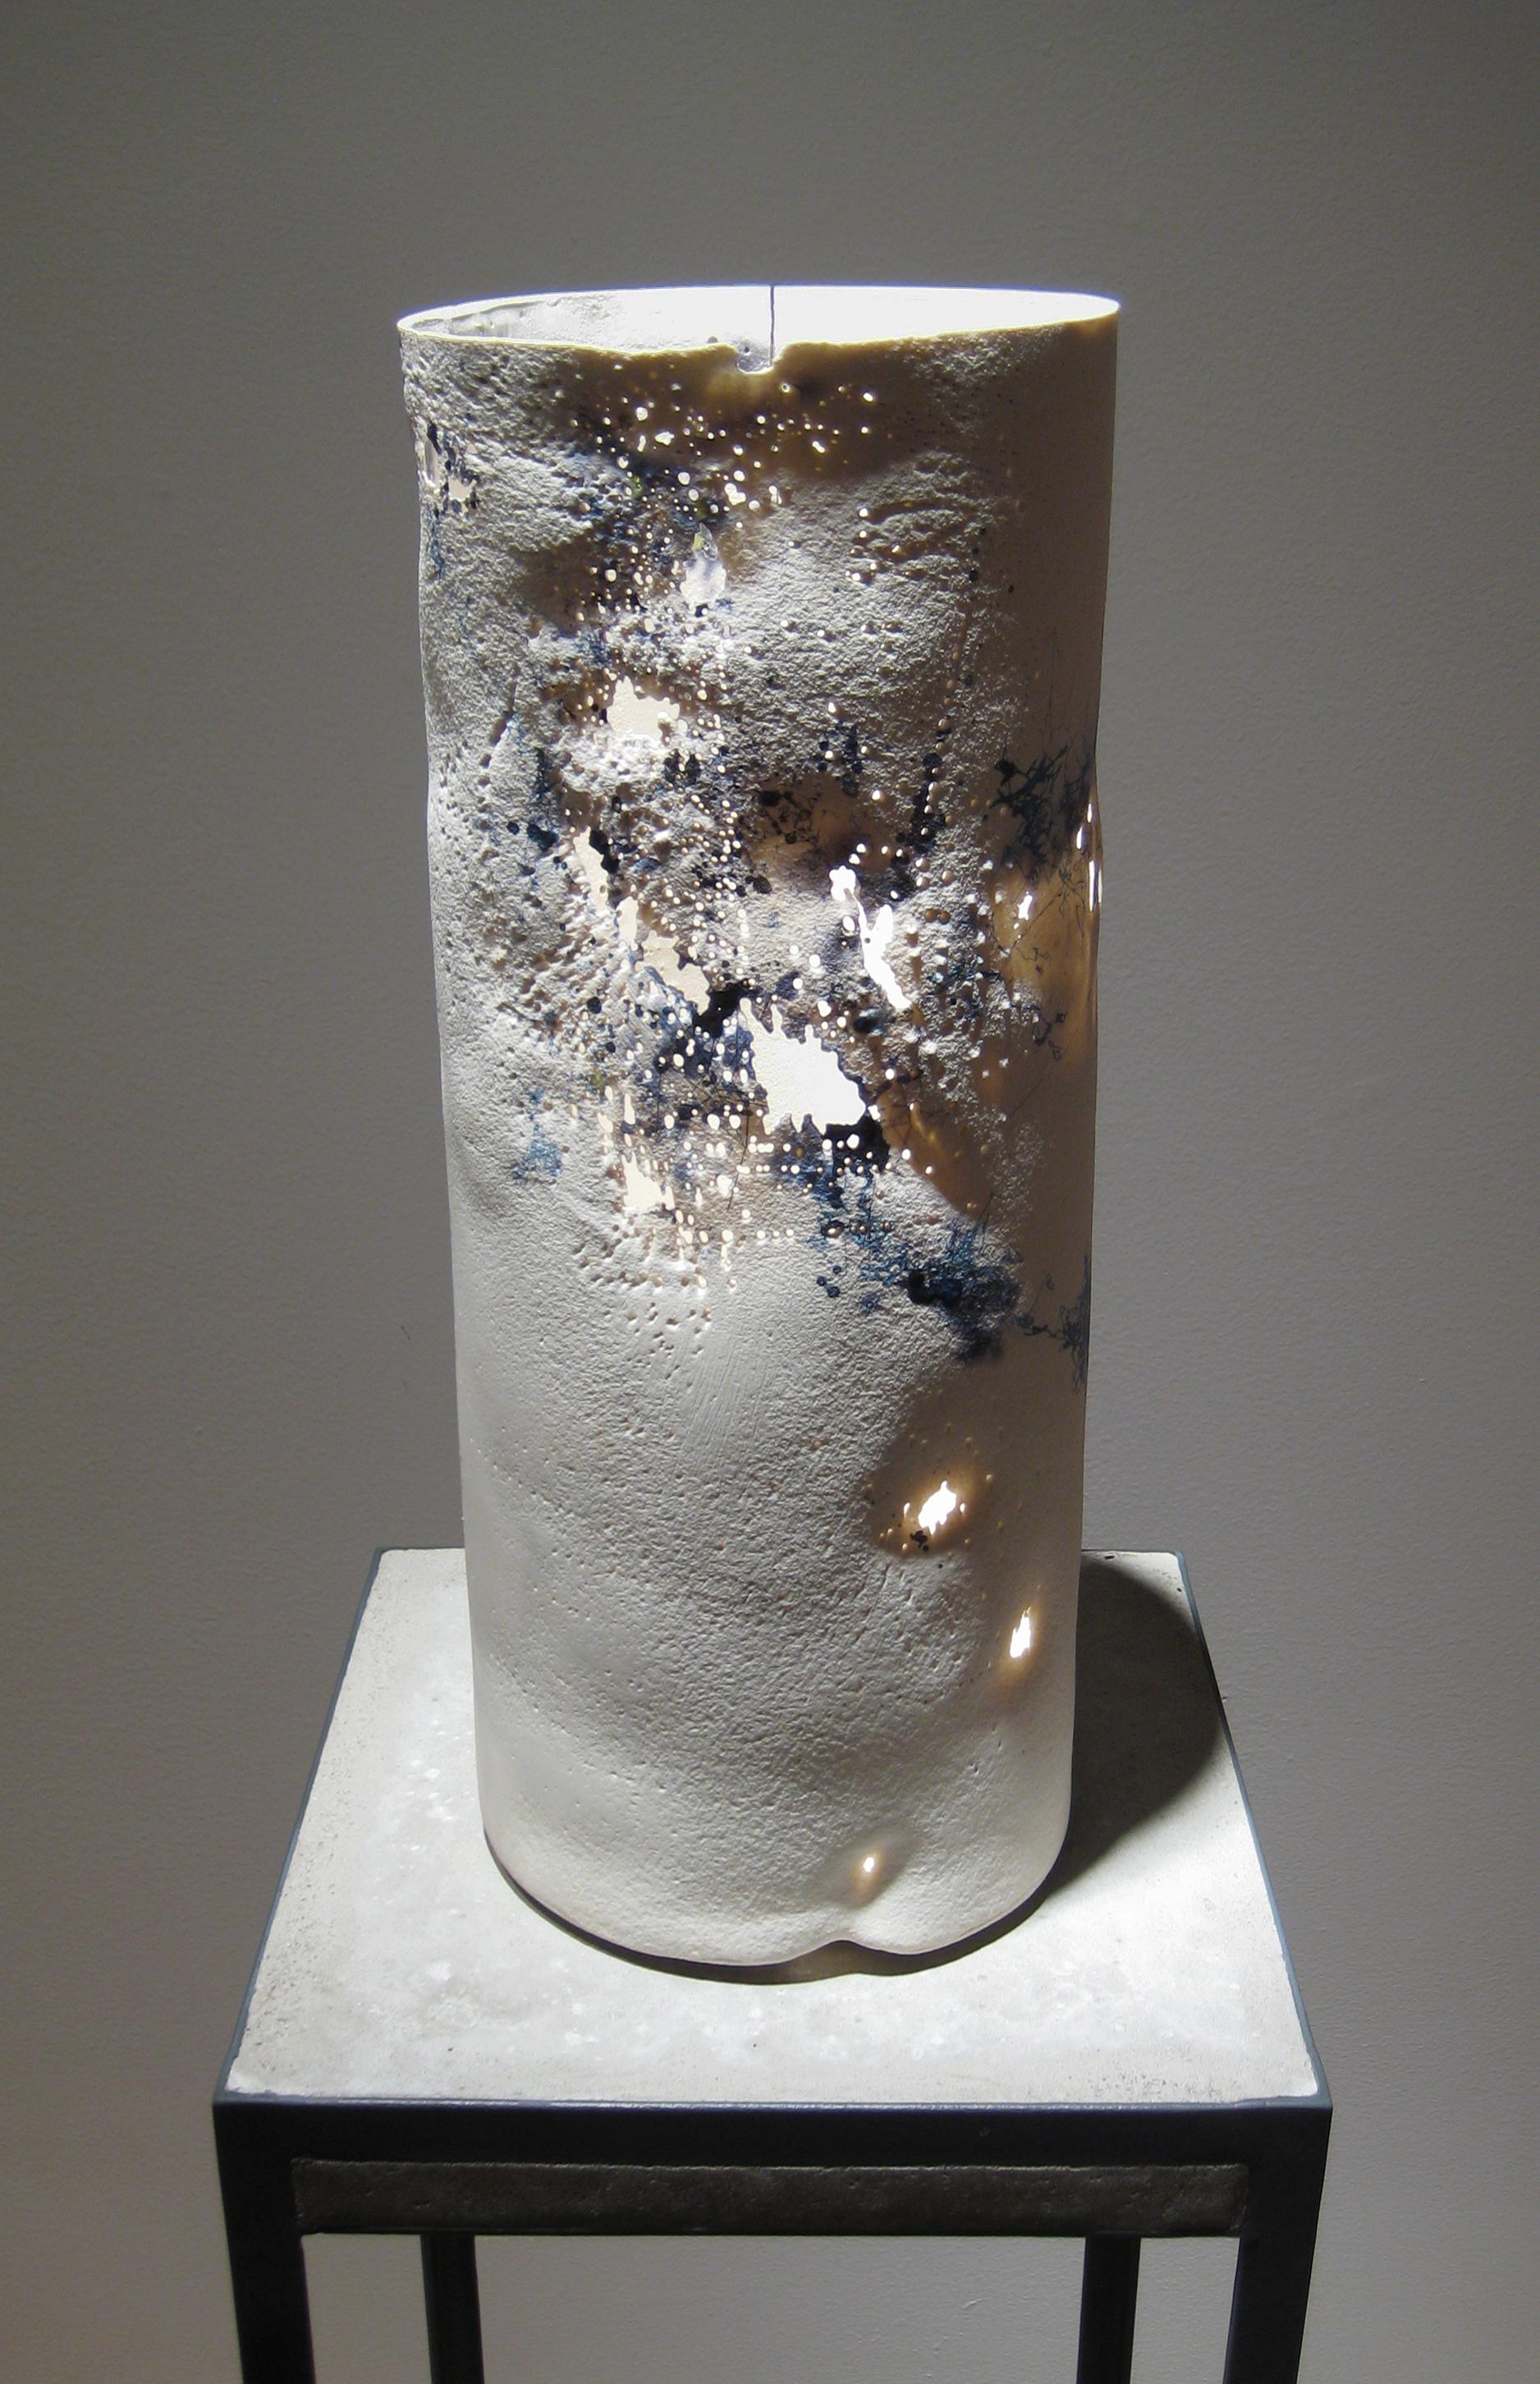 Lumene 2, 2010   cast porcelain, ceramic decals, lead frits